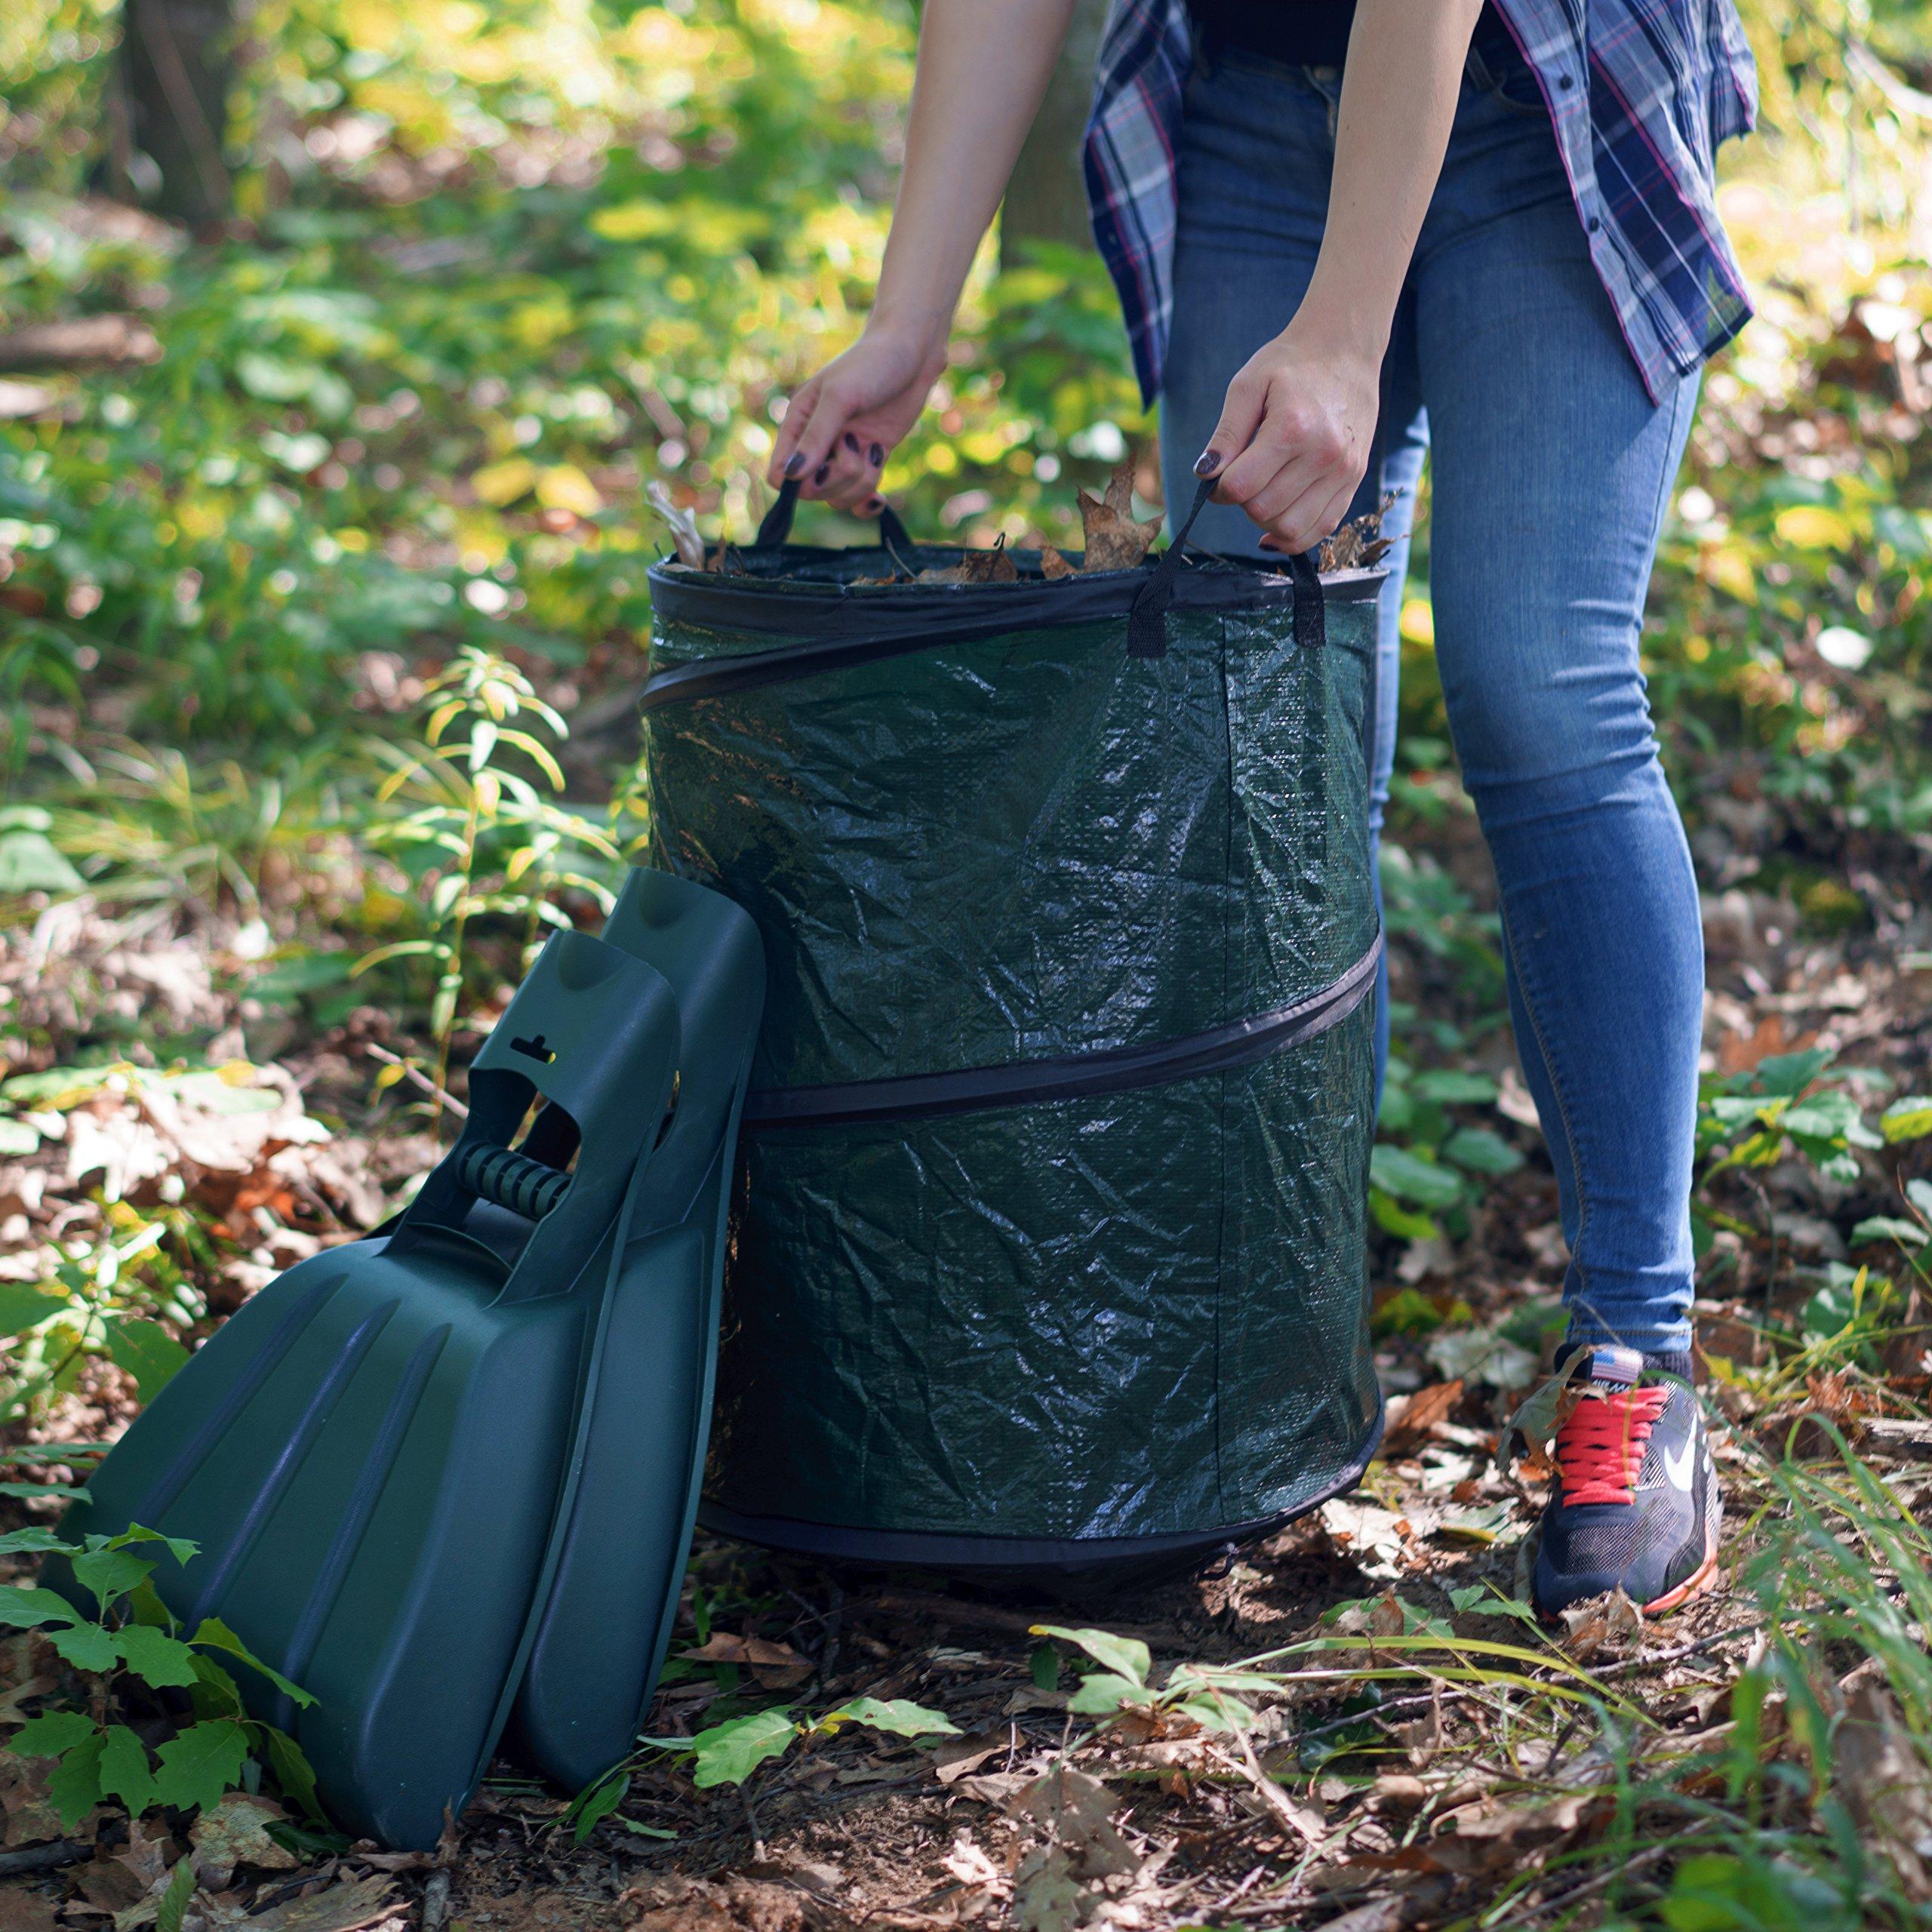 Kenley Leaf Scoops with Collapsible Yard Waste Garbage Bag Composting Bin – Leaf Hand Rakes for Leaves Grass Debris - Grabber Picker Tool for Garden or Lawn with Pop Up Composting Garbage Bag by Kenley (Image #6)